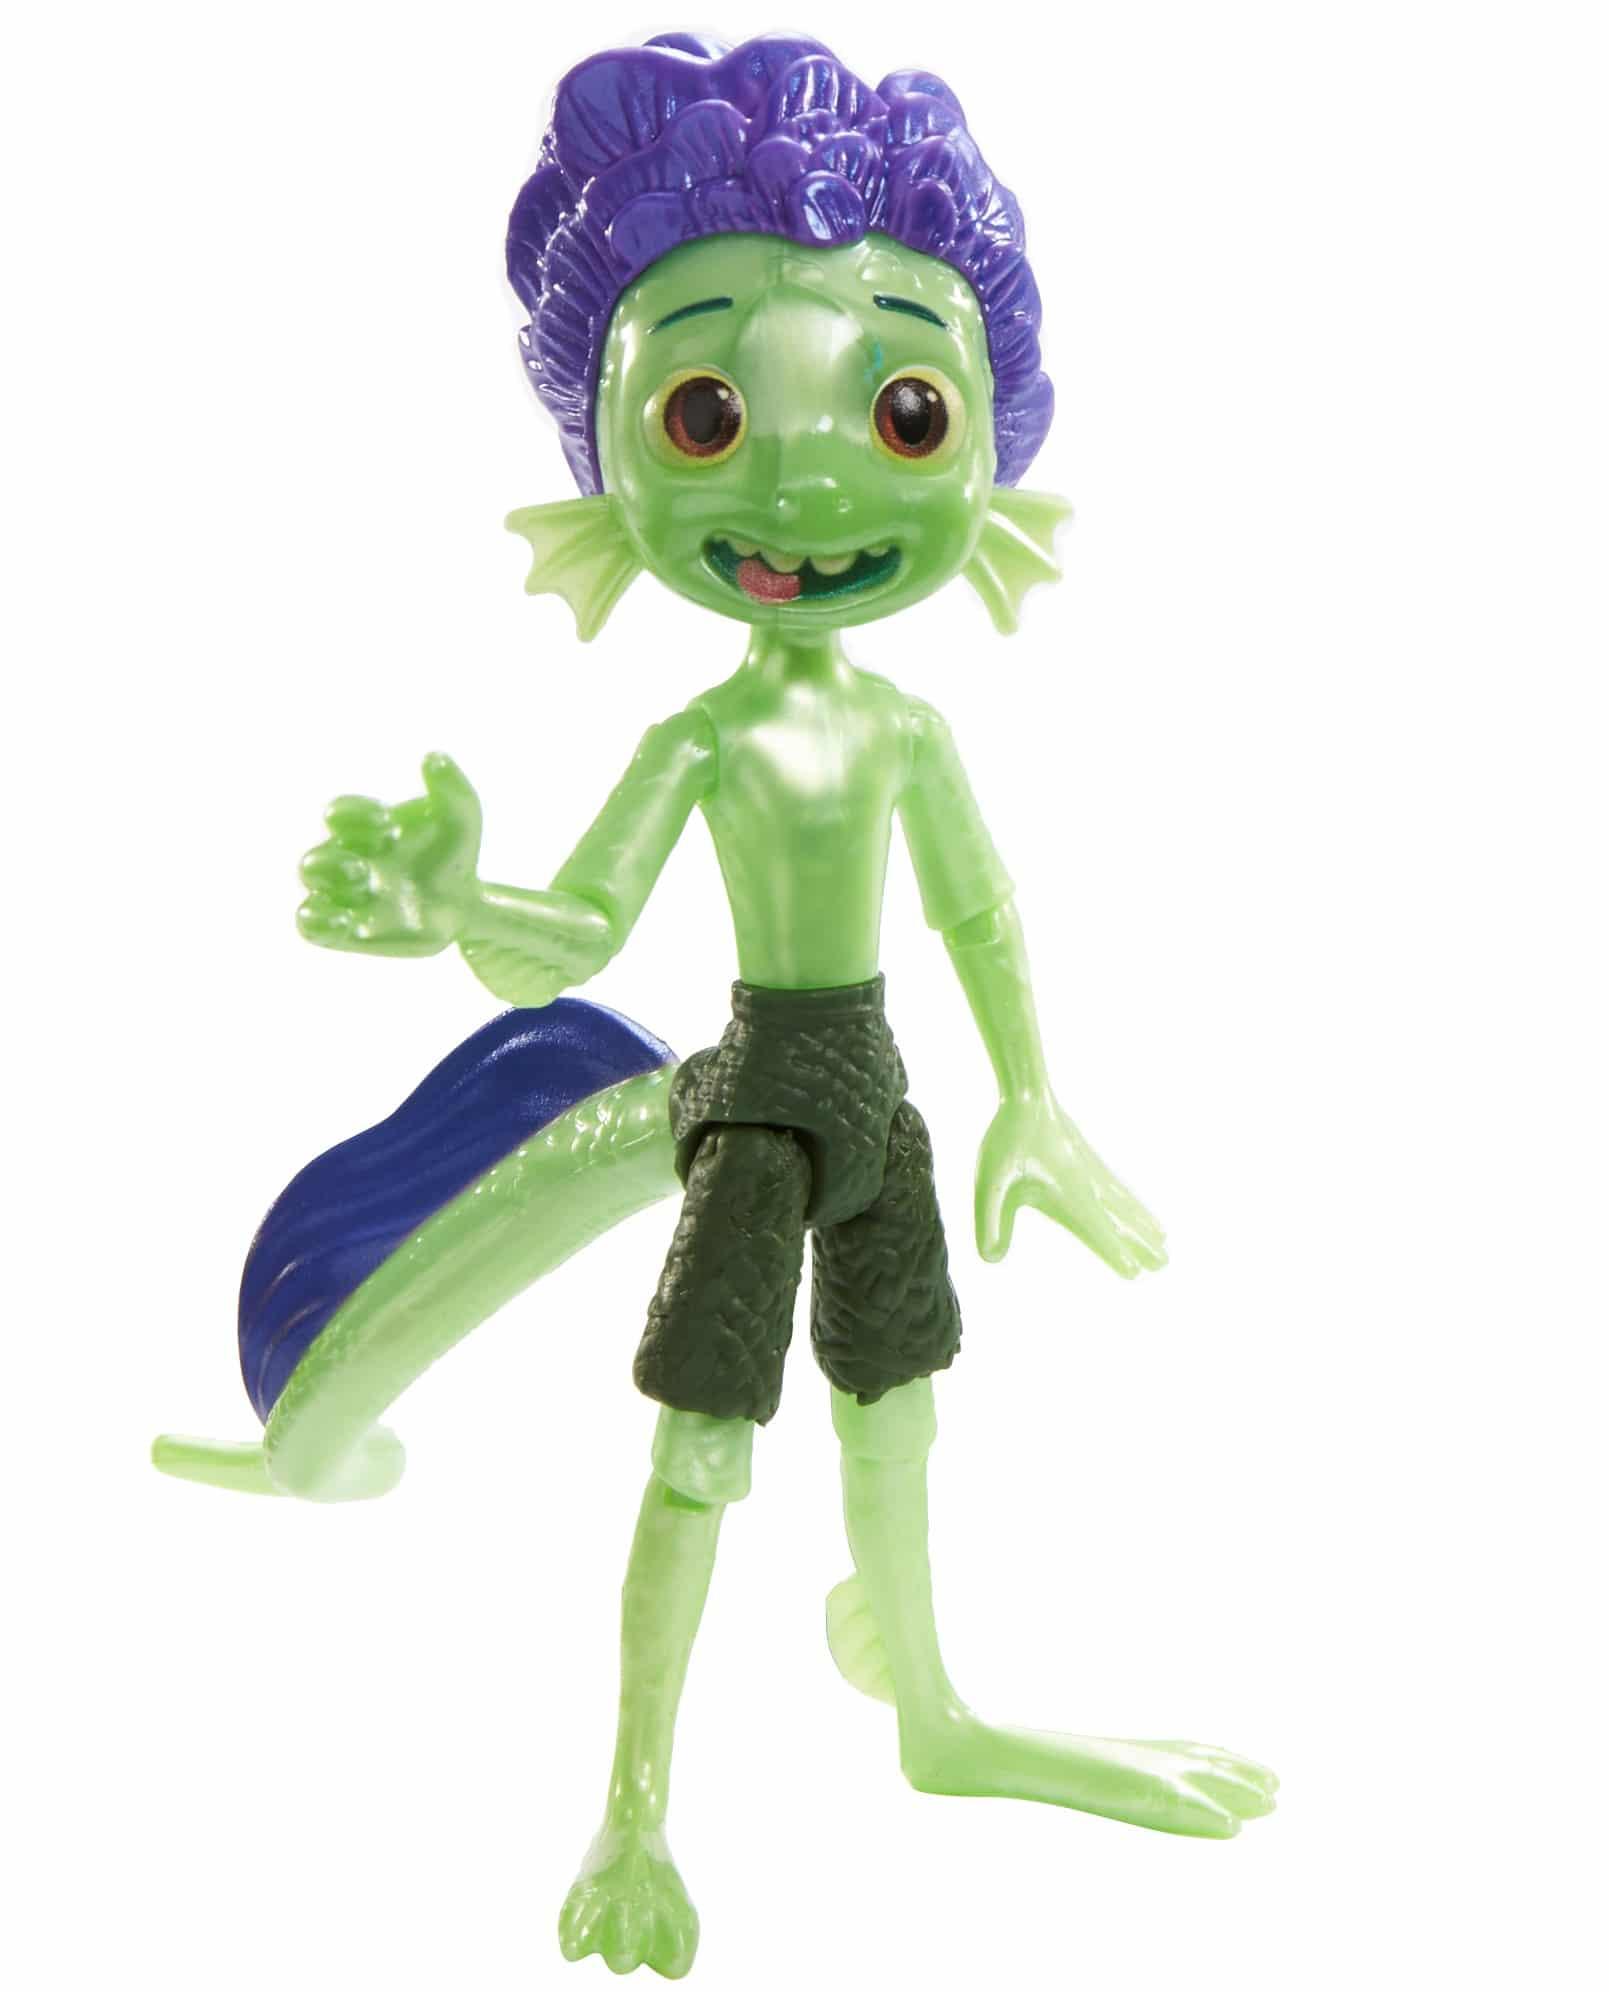 Mattel unveils Luca action figures ahead of the film's Disney+ premiere 19